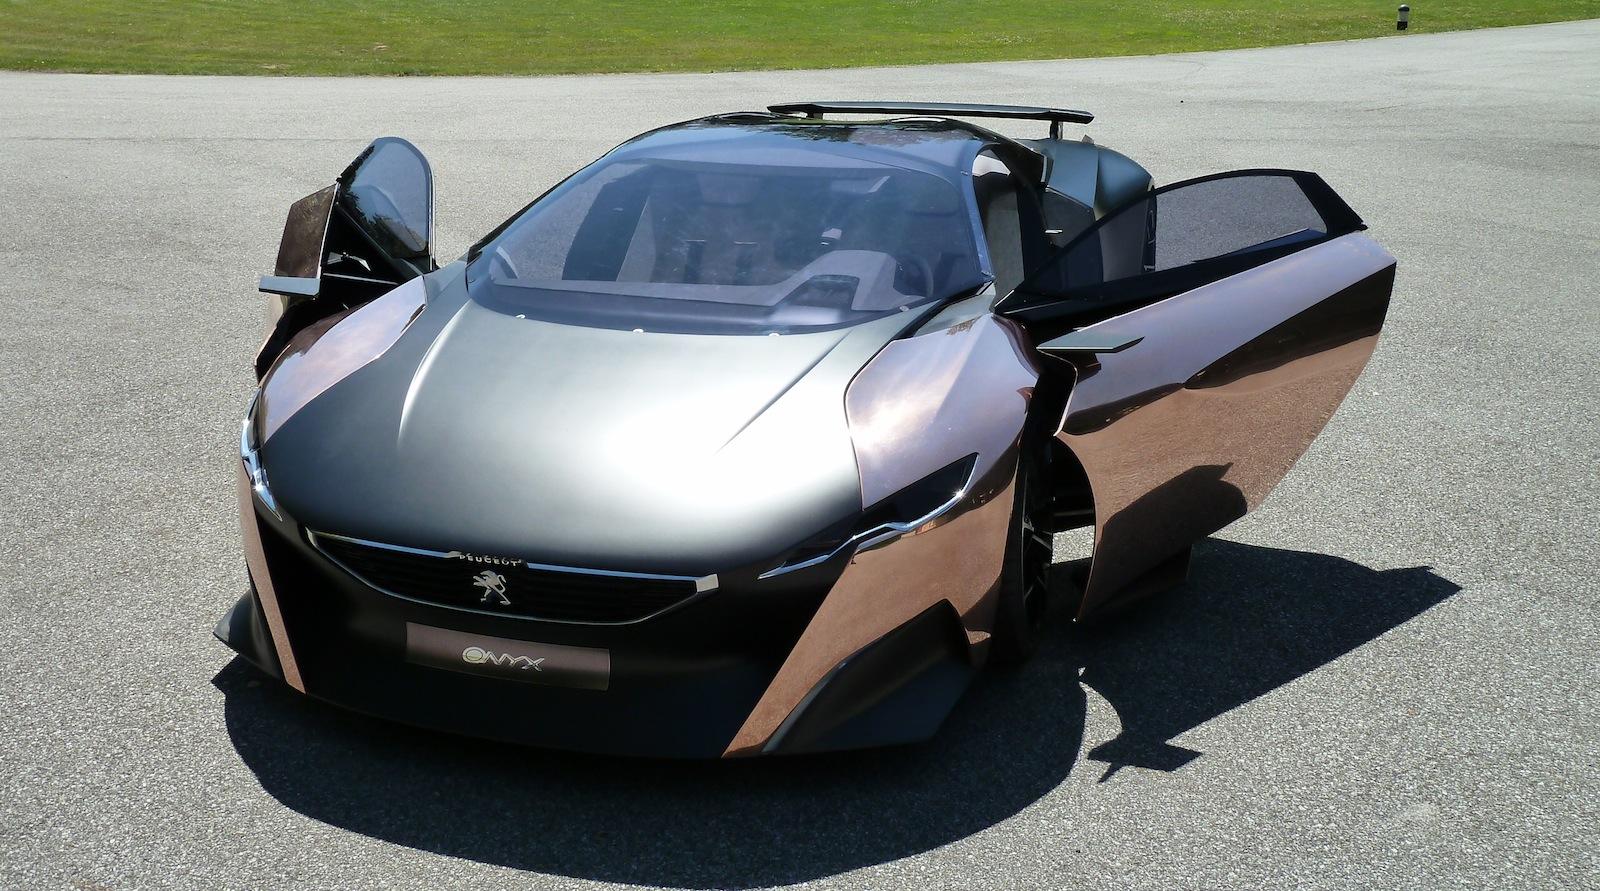 Peugeot Onyx Car Price